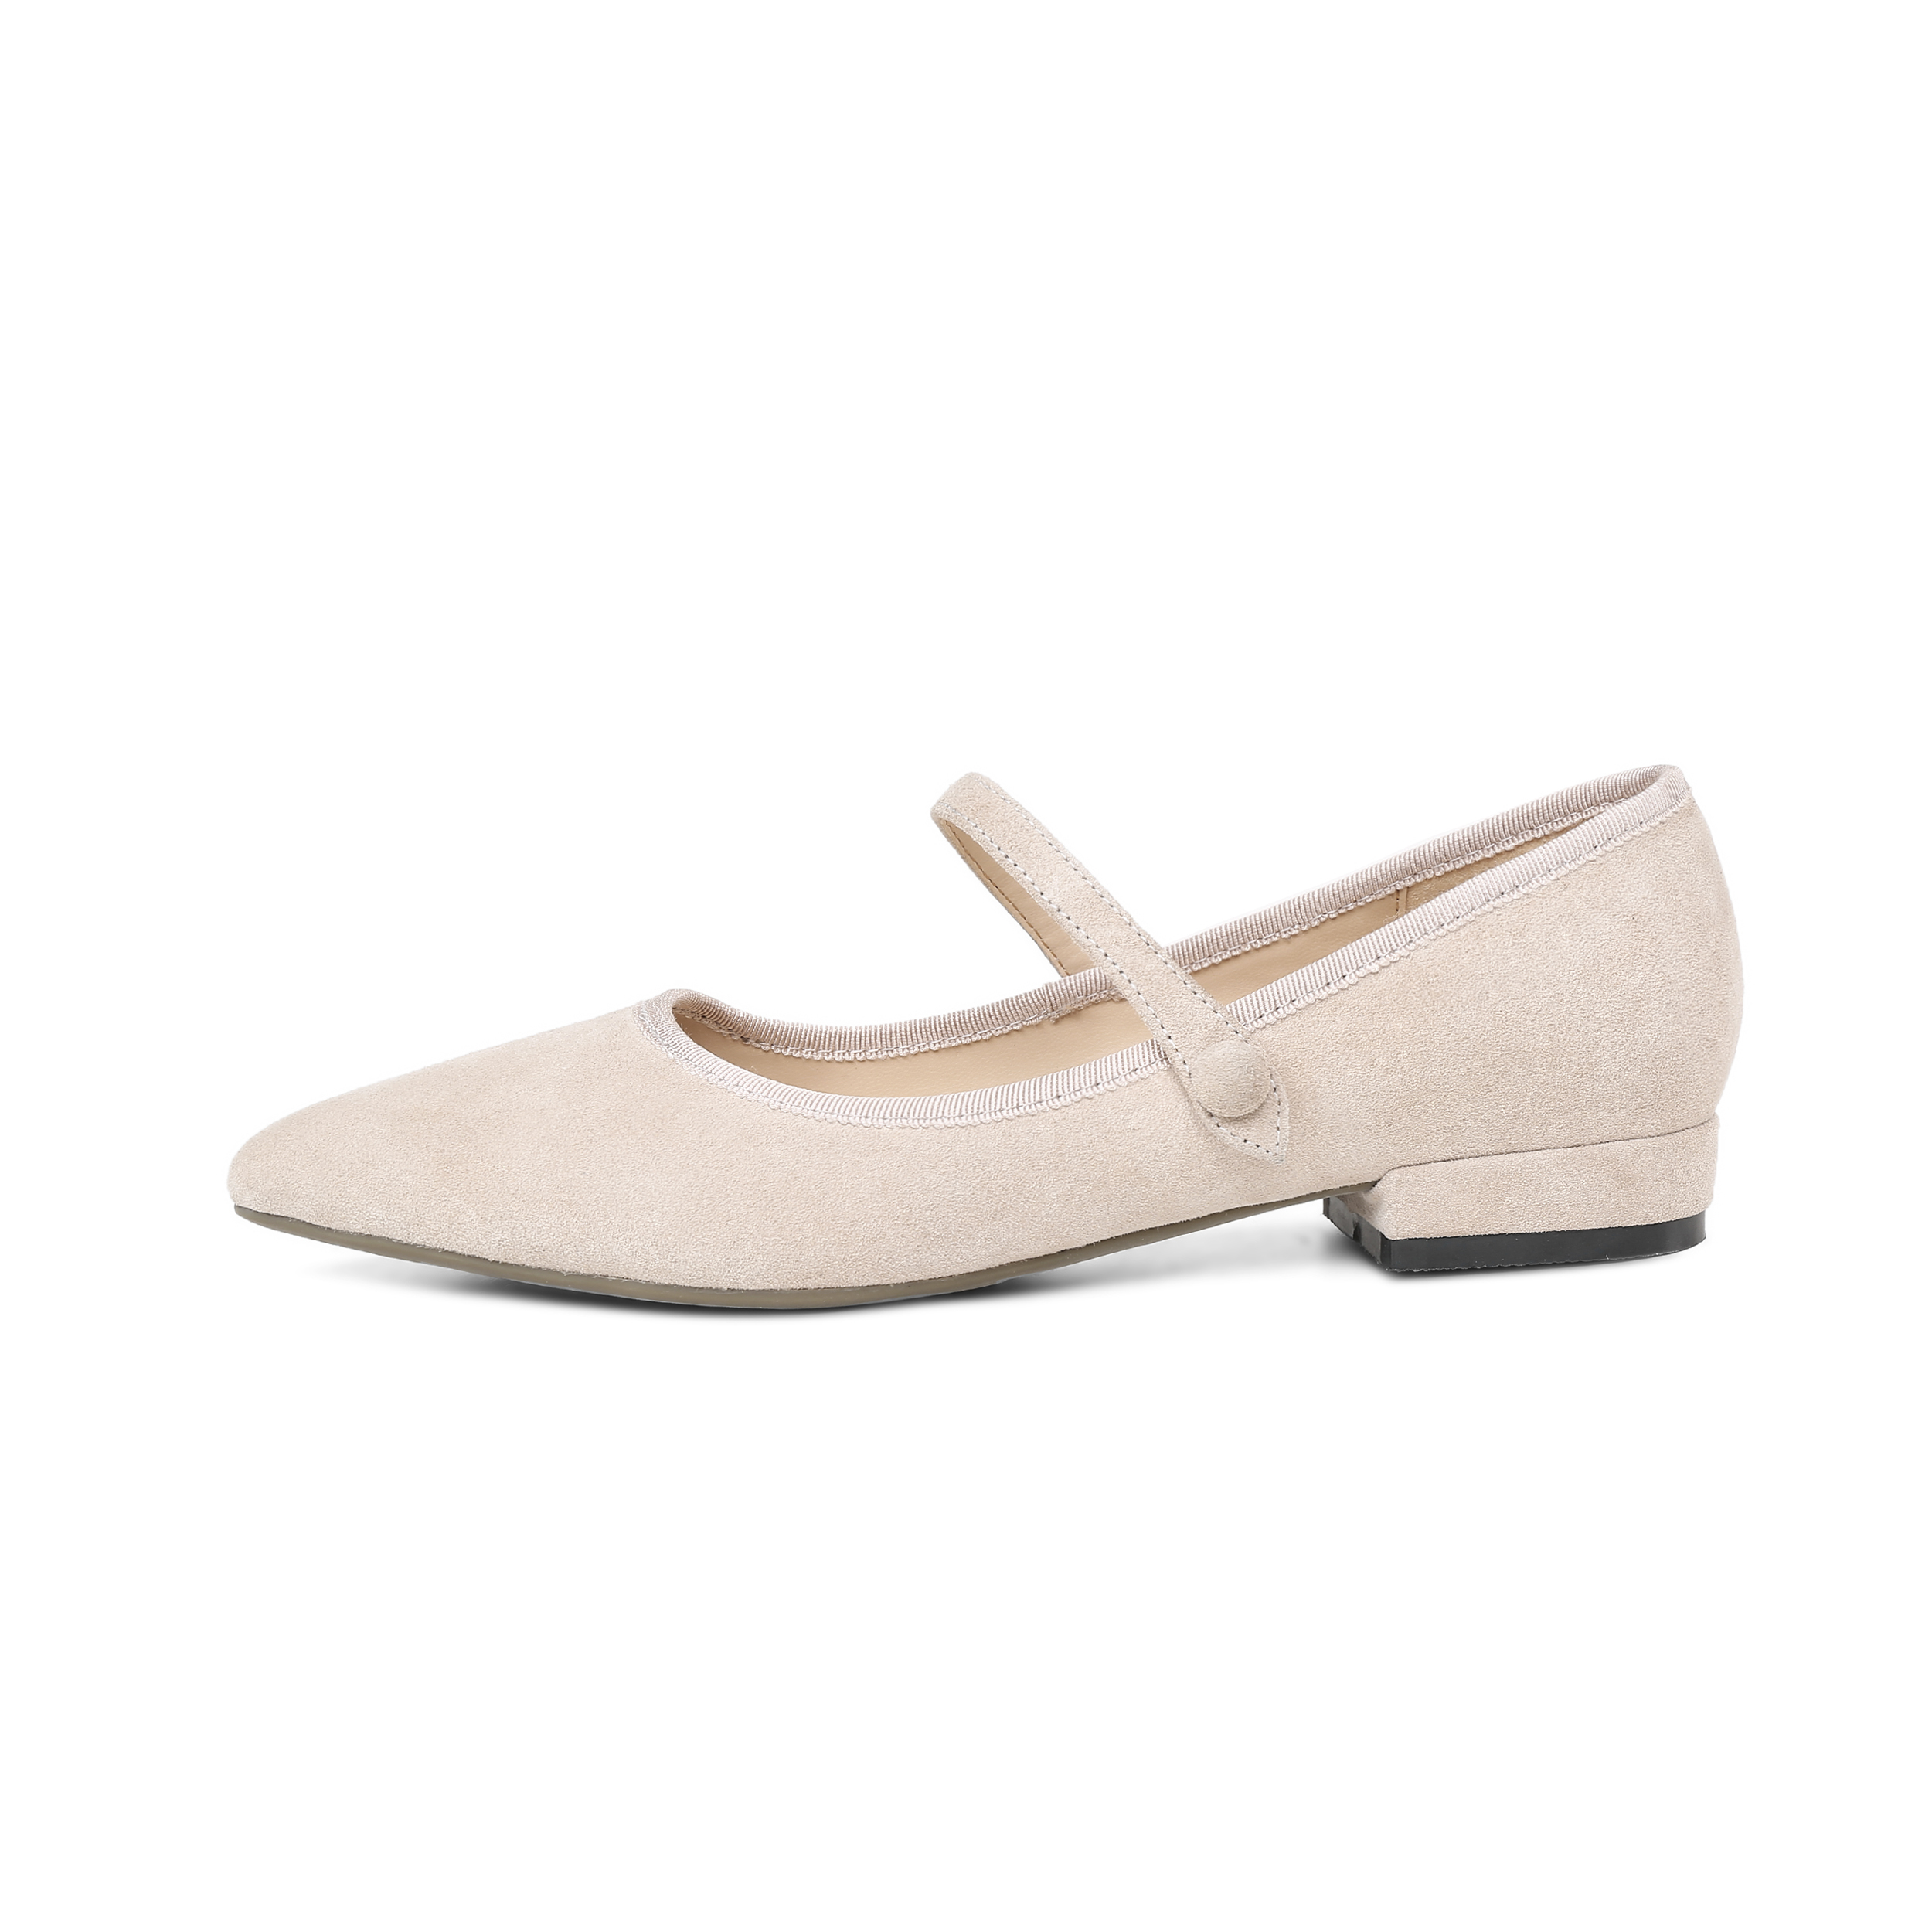 649d20ae359 US  48 - Arden Furtado 2018 spring autumn new style shoes woman buckle  strap square heels ballet flats pink fashion ladies shoes women -  www.ardenfurtado. ...